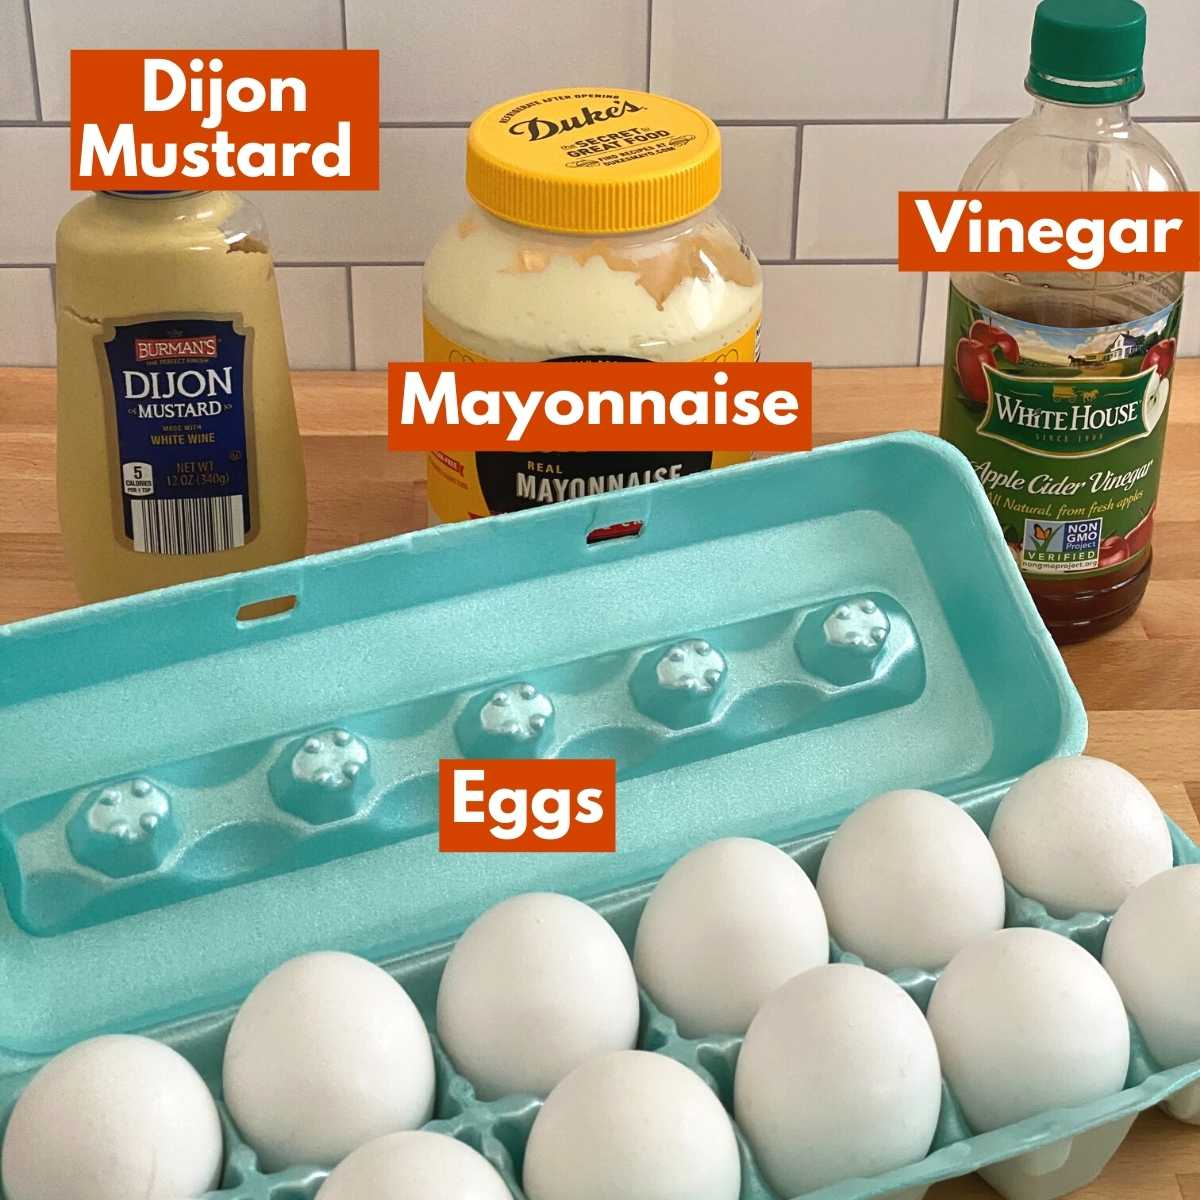 Ingredients to make recipe: eggs, mayonnaise, Dijon mustard, apple cider vinegar.